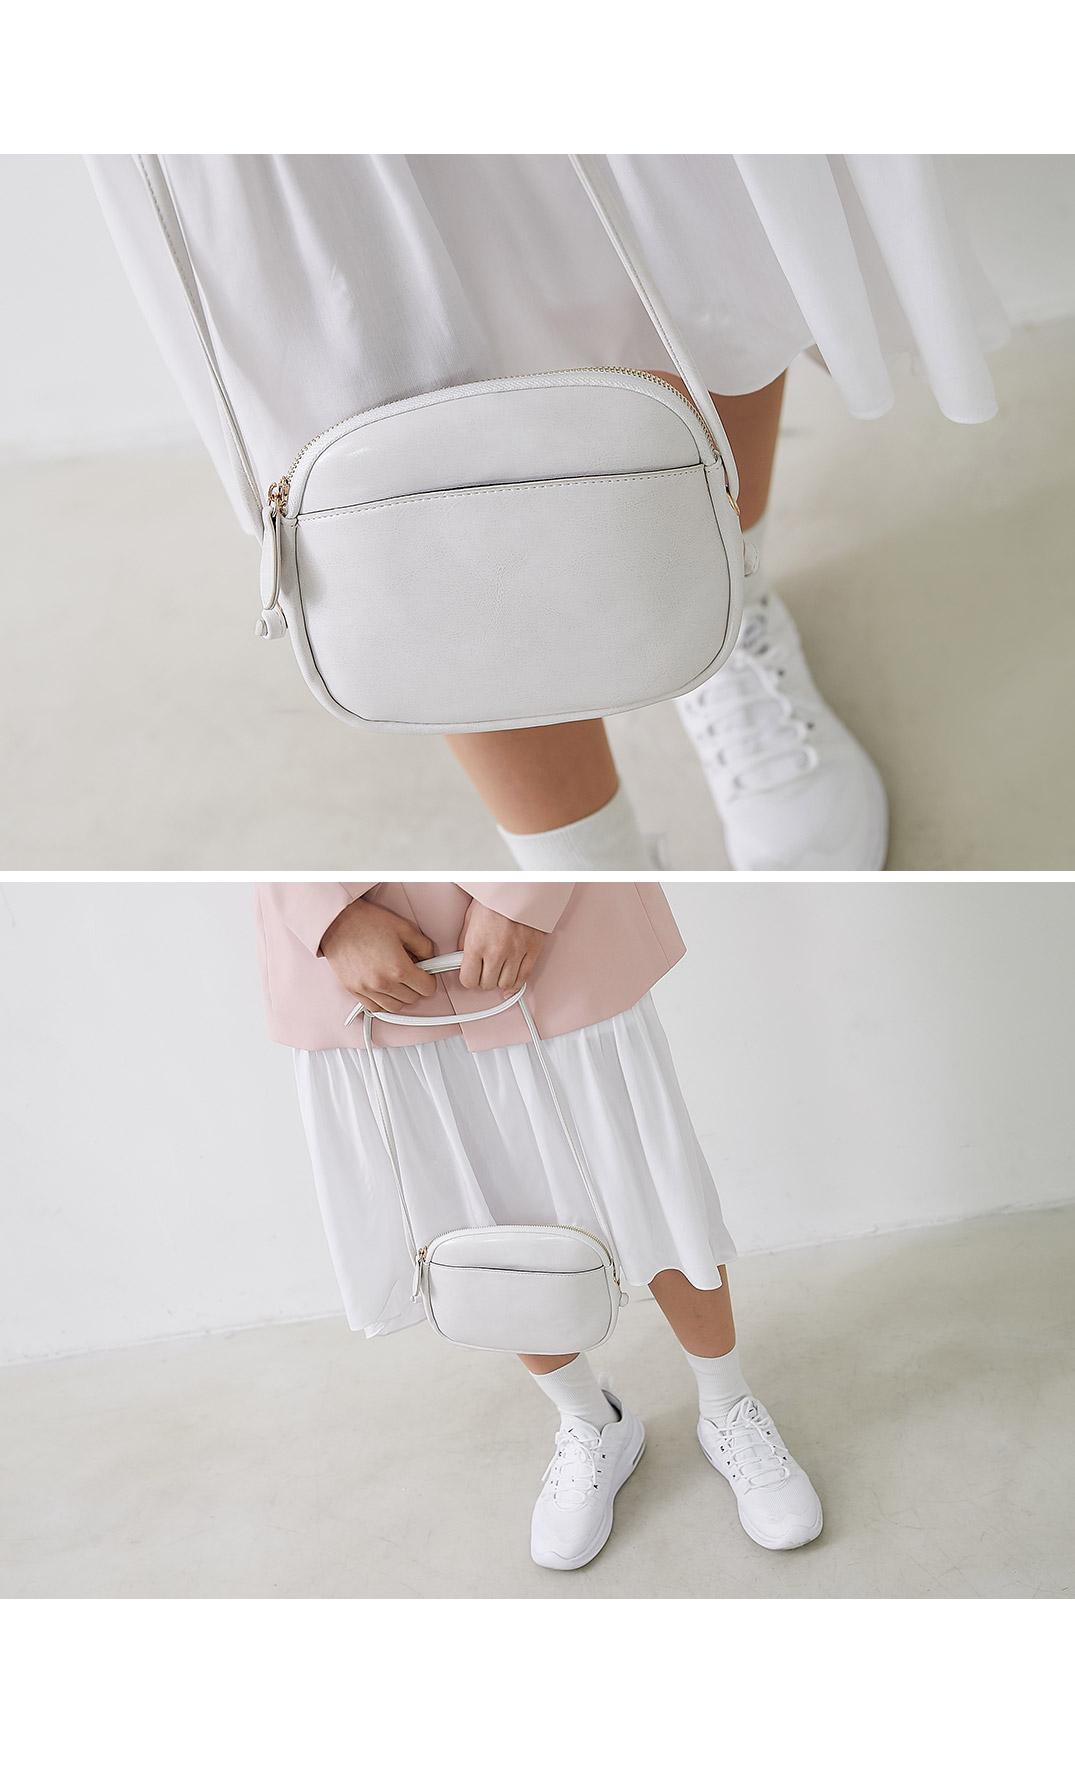 Hezzon shoulder bag